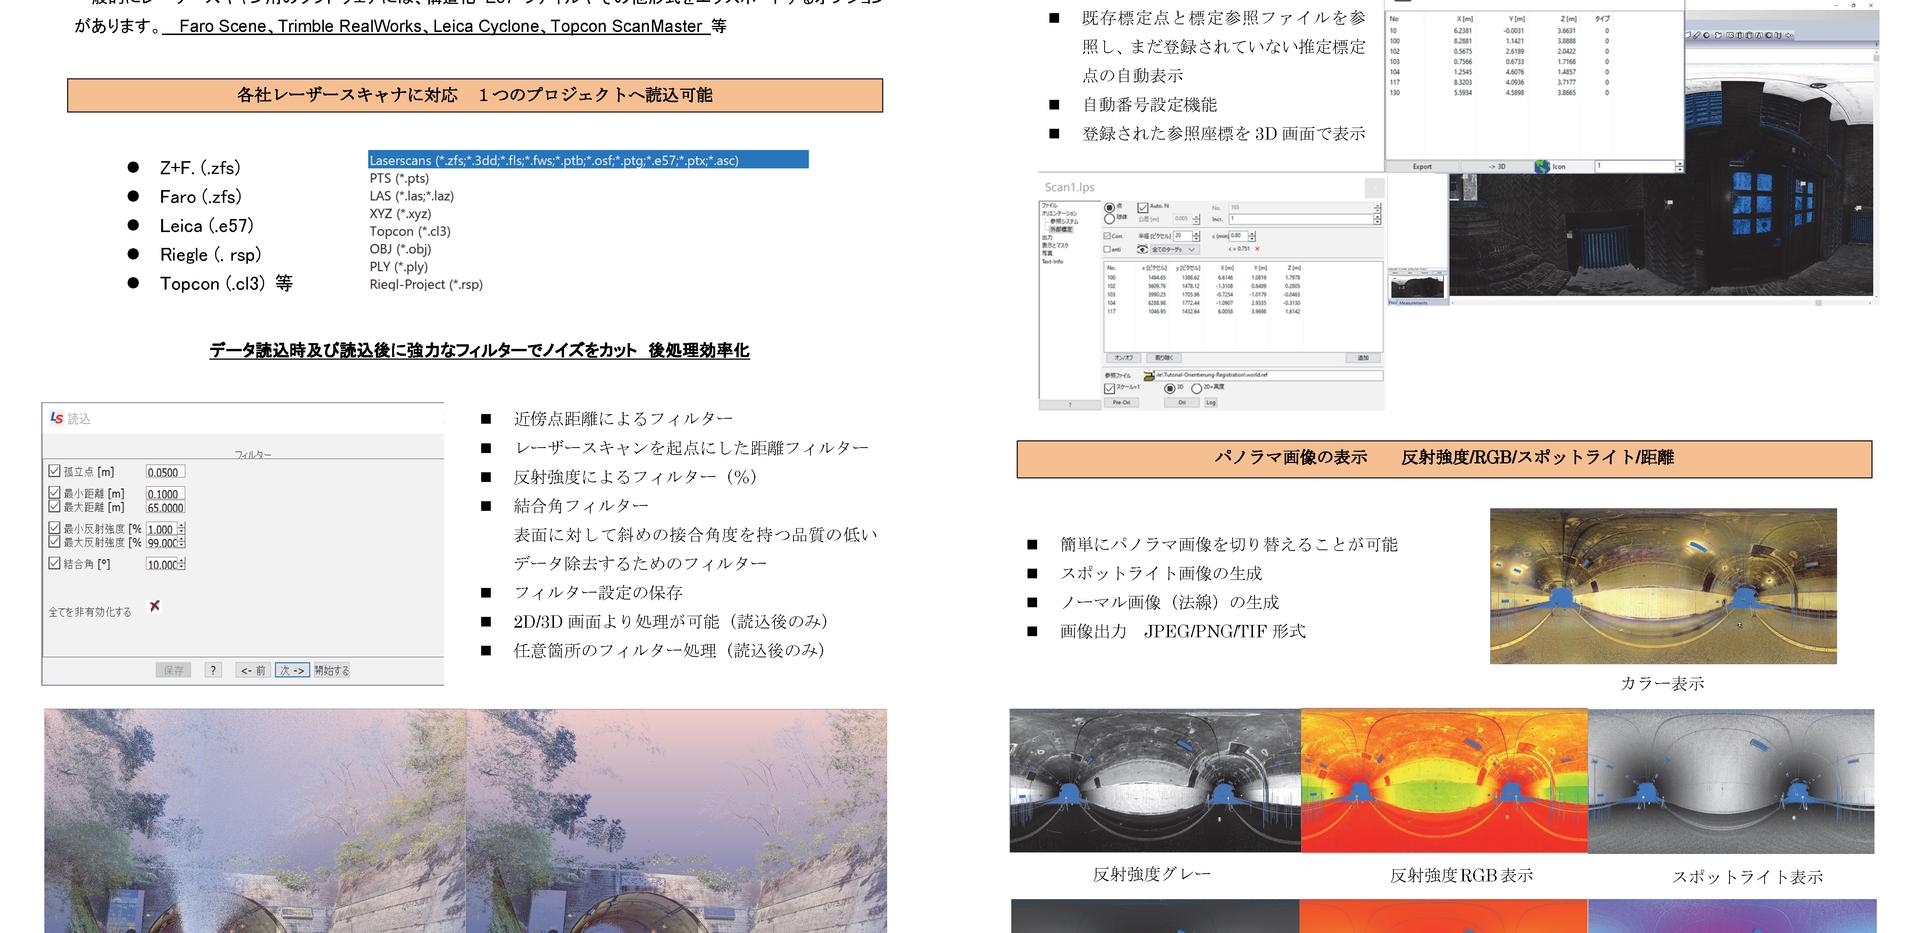 LupoScan Catalog20210324 HP用_ページ_2.png